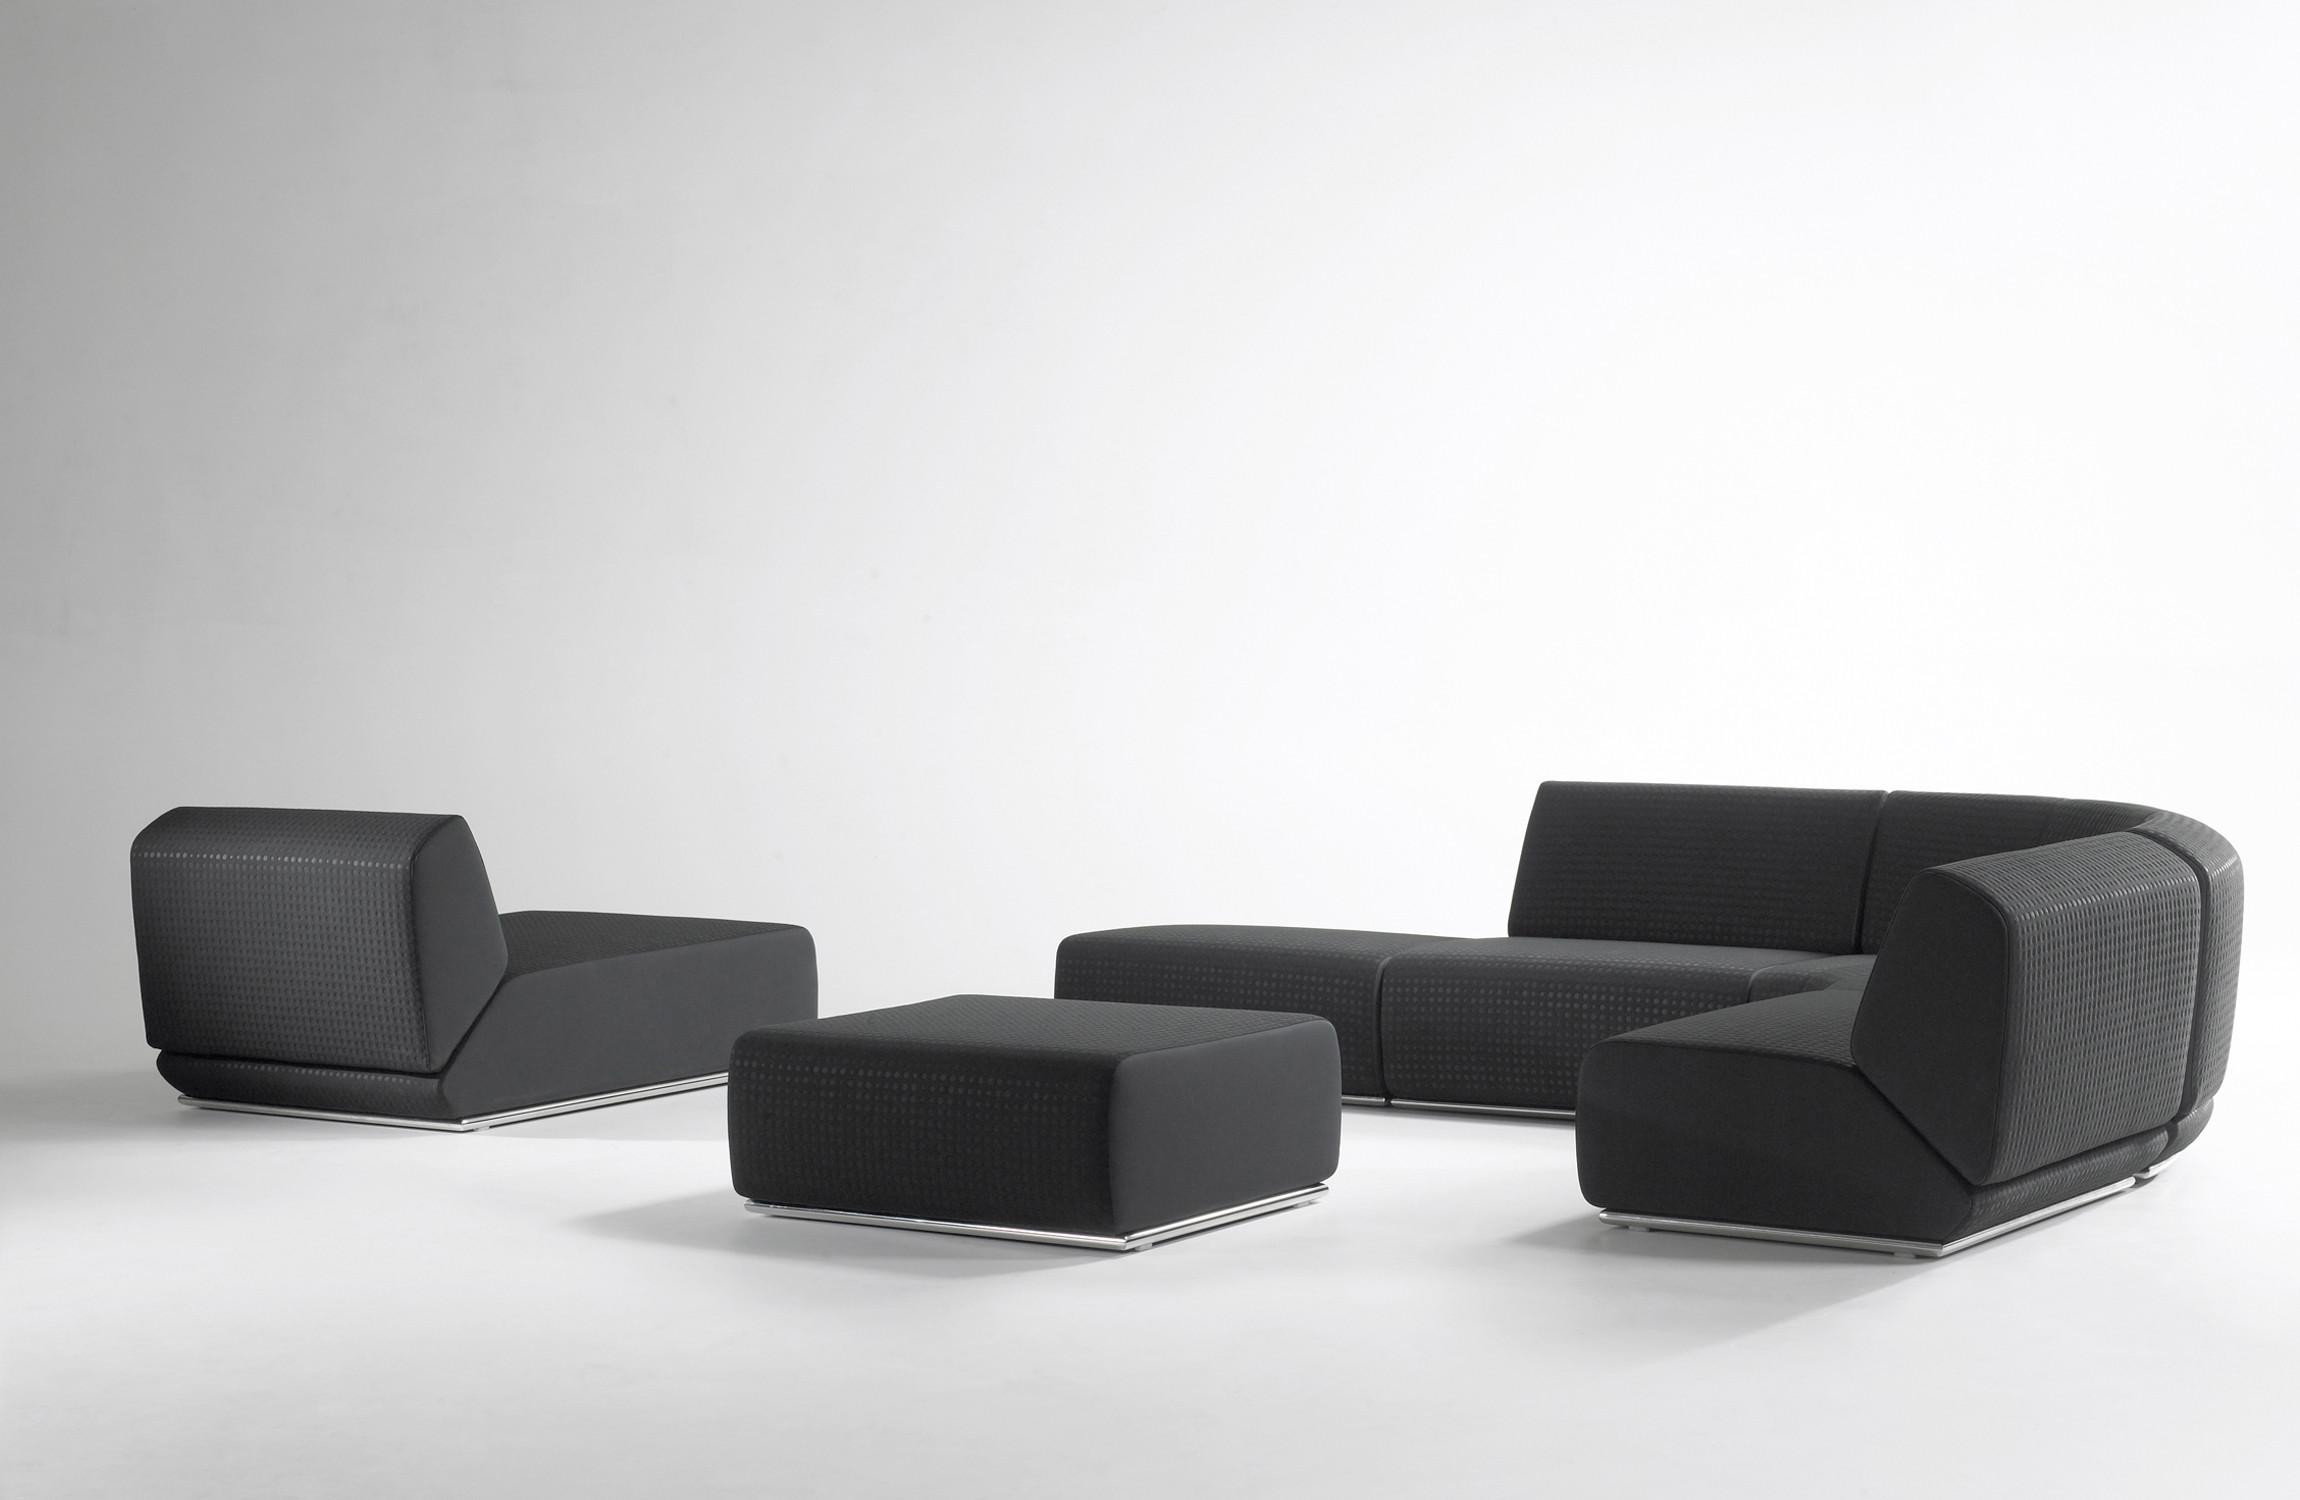 Manhattan Soft Seating Furniture